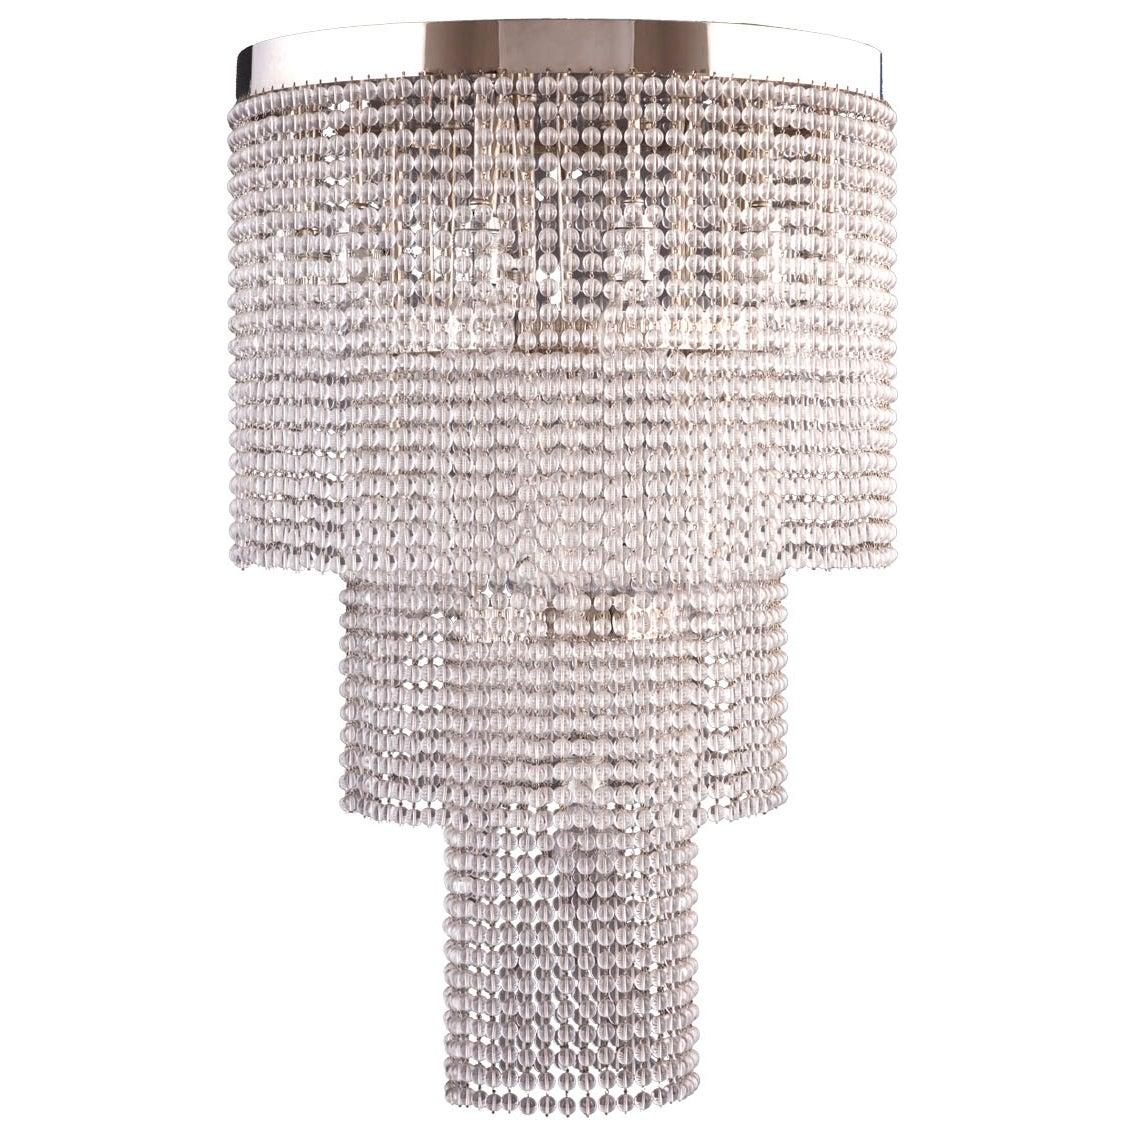 Josef Hoffmann&Wiener Werkstatte Ceiling Lamp Chandelier Re-Edition